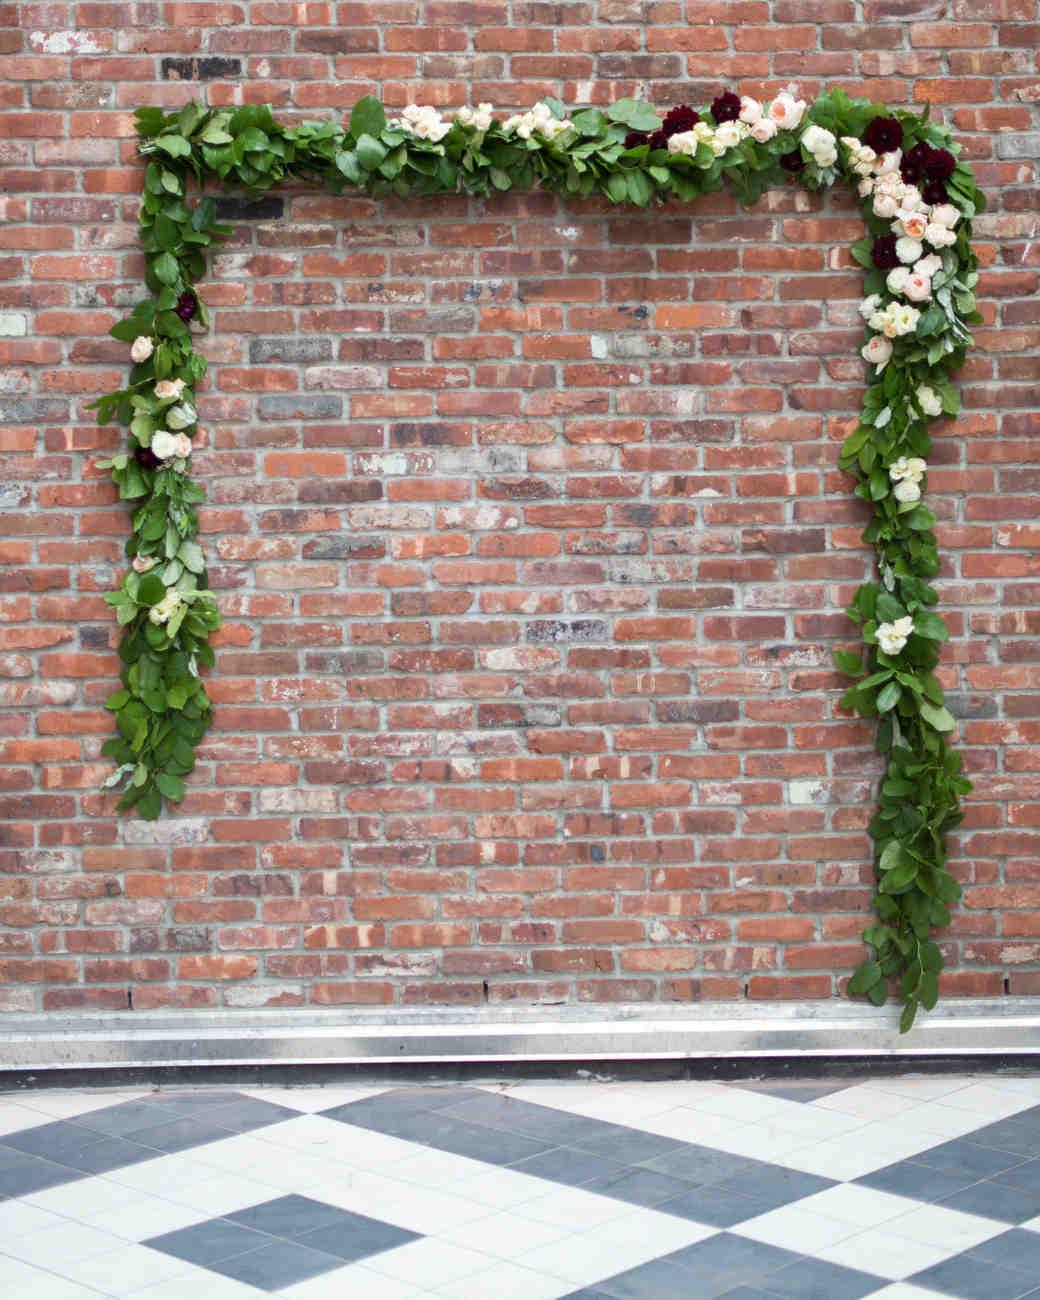 caitlin-michael-wedding-garland-677-s111835-0415.jpg